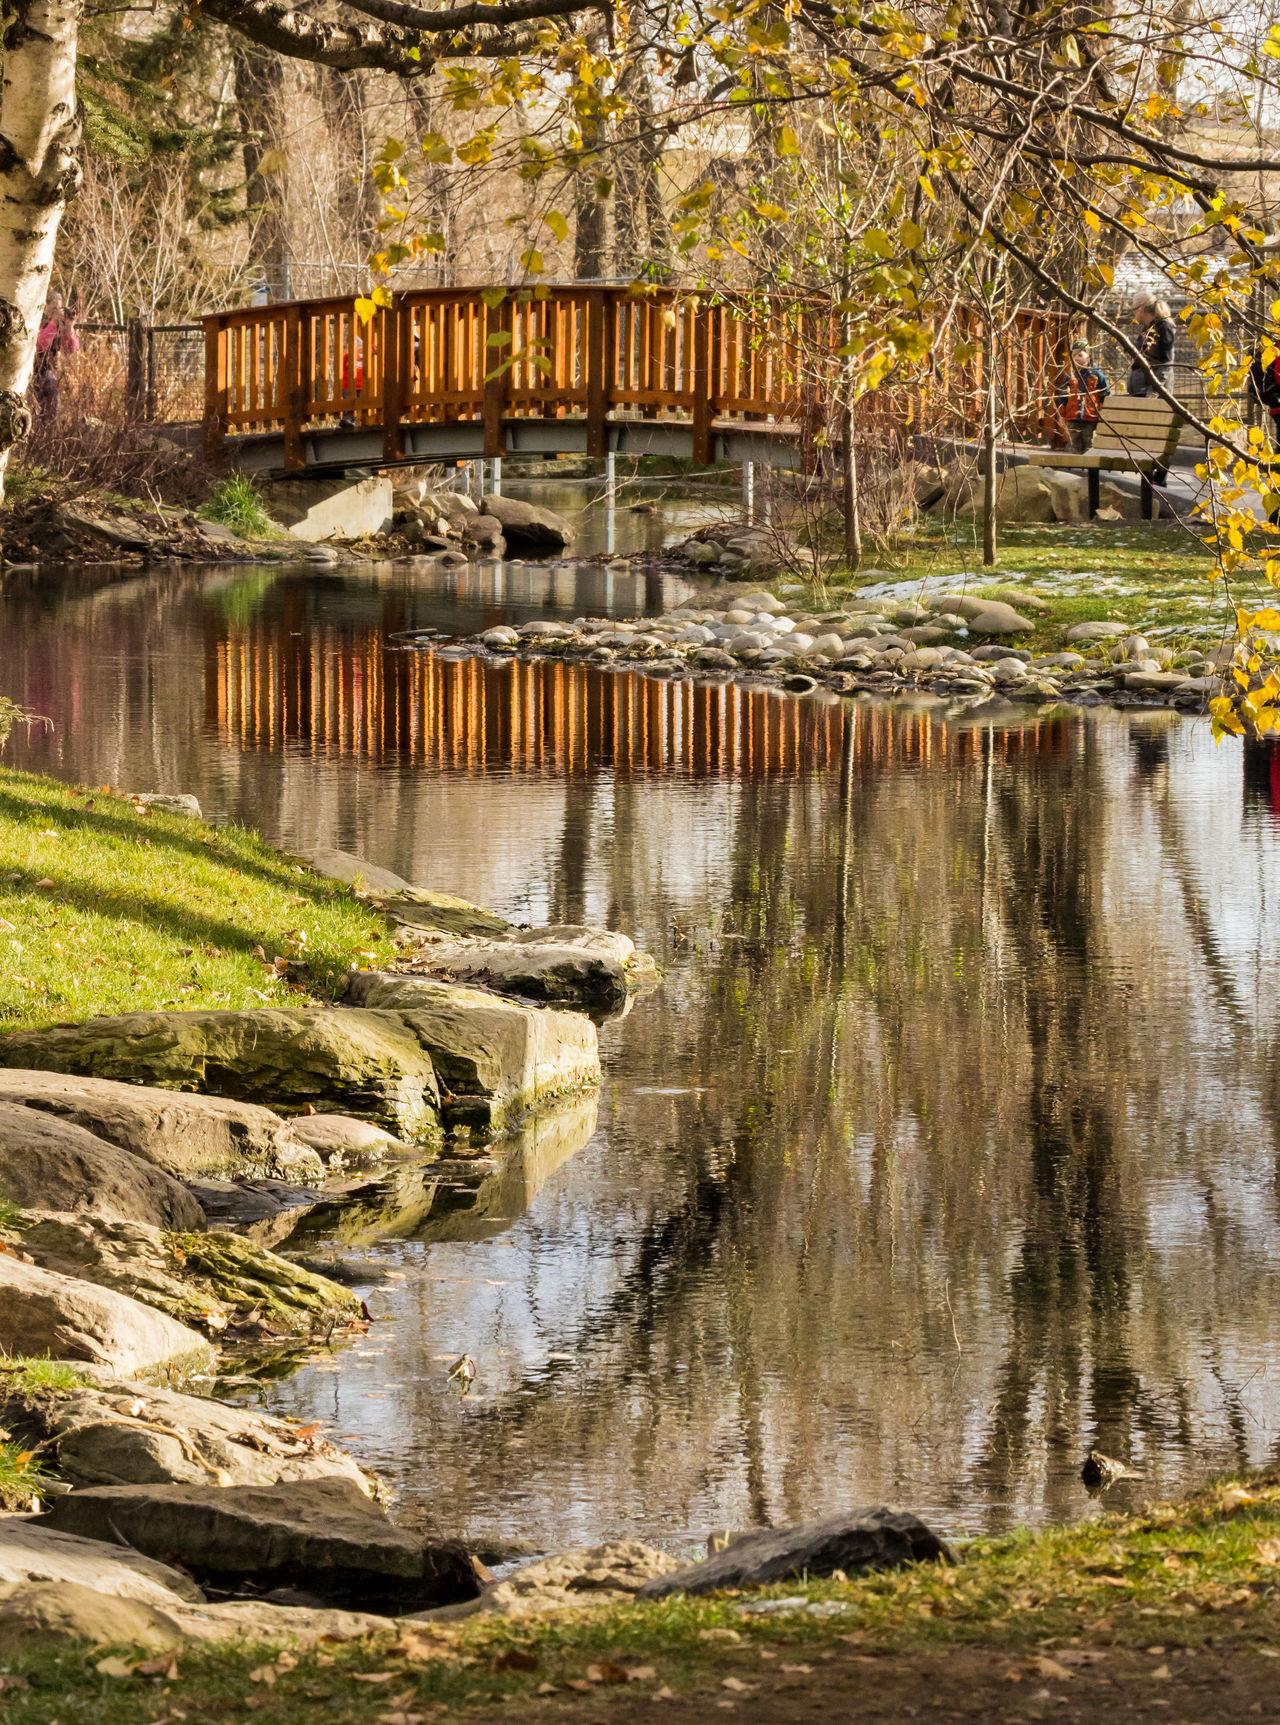 Autumn reflections. Autumn Bridge Day Lake Nature No People Outdoors Reflection Scenics Shoreline Tranquil Scene Tranquility Tree Water Wooden Bridge